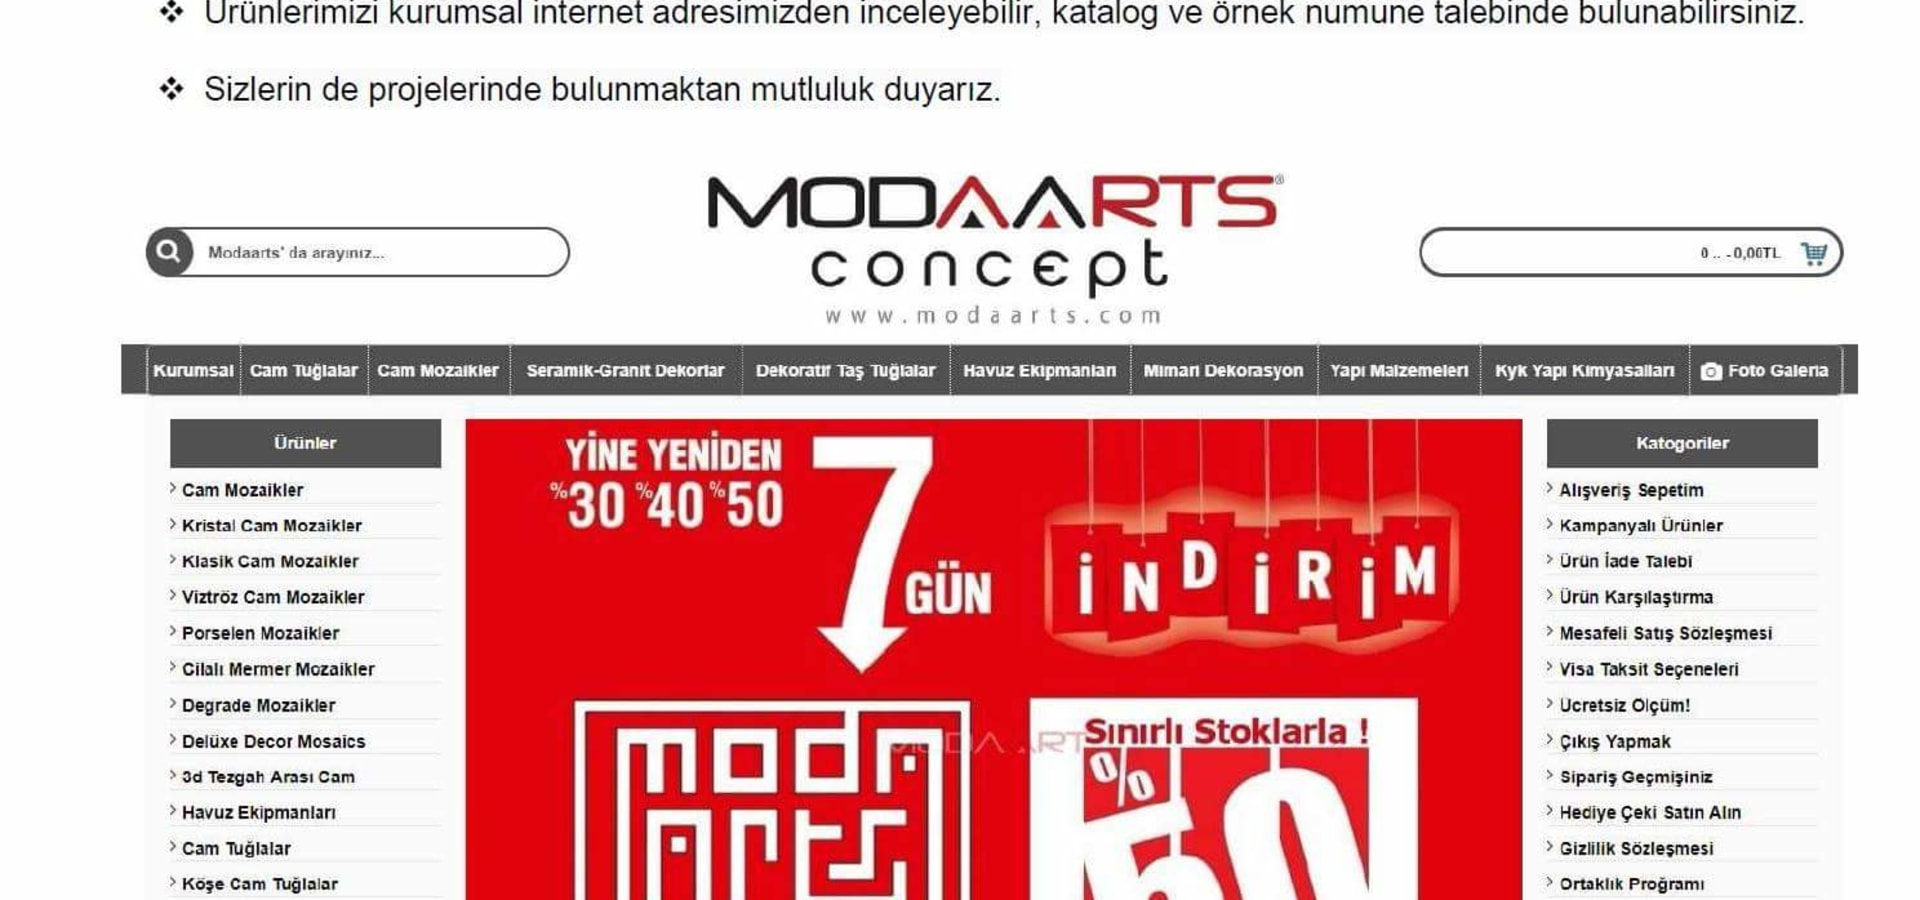 Modakristal İnşaat San.Tic.Ltd.Şti.